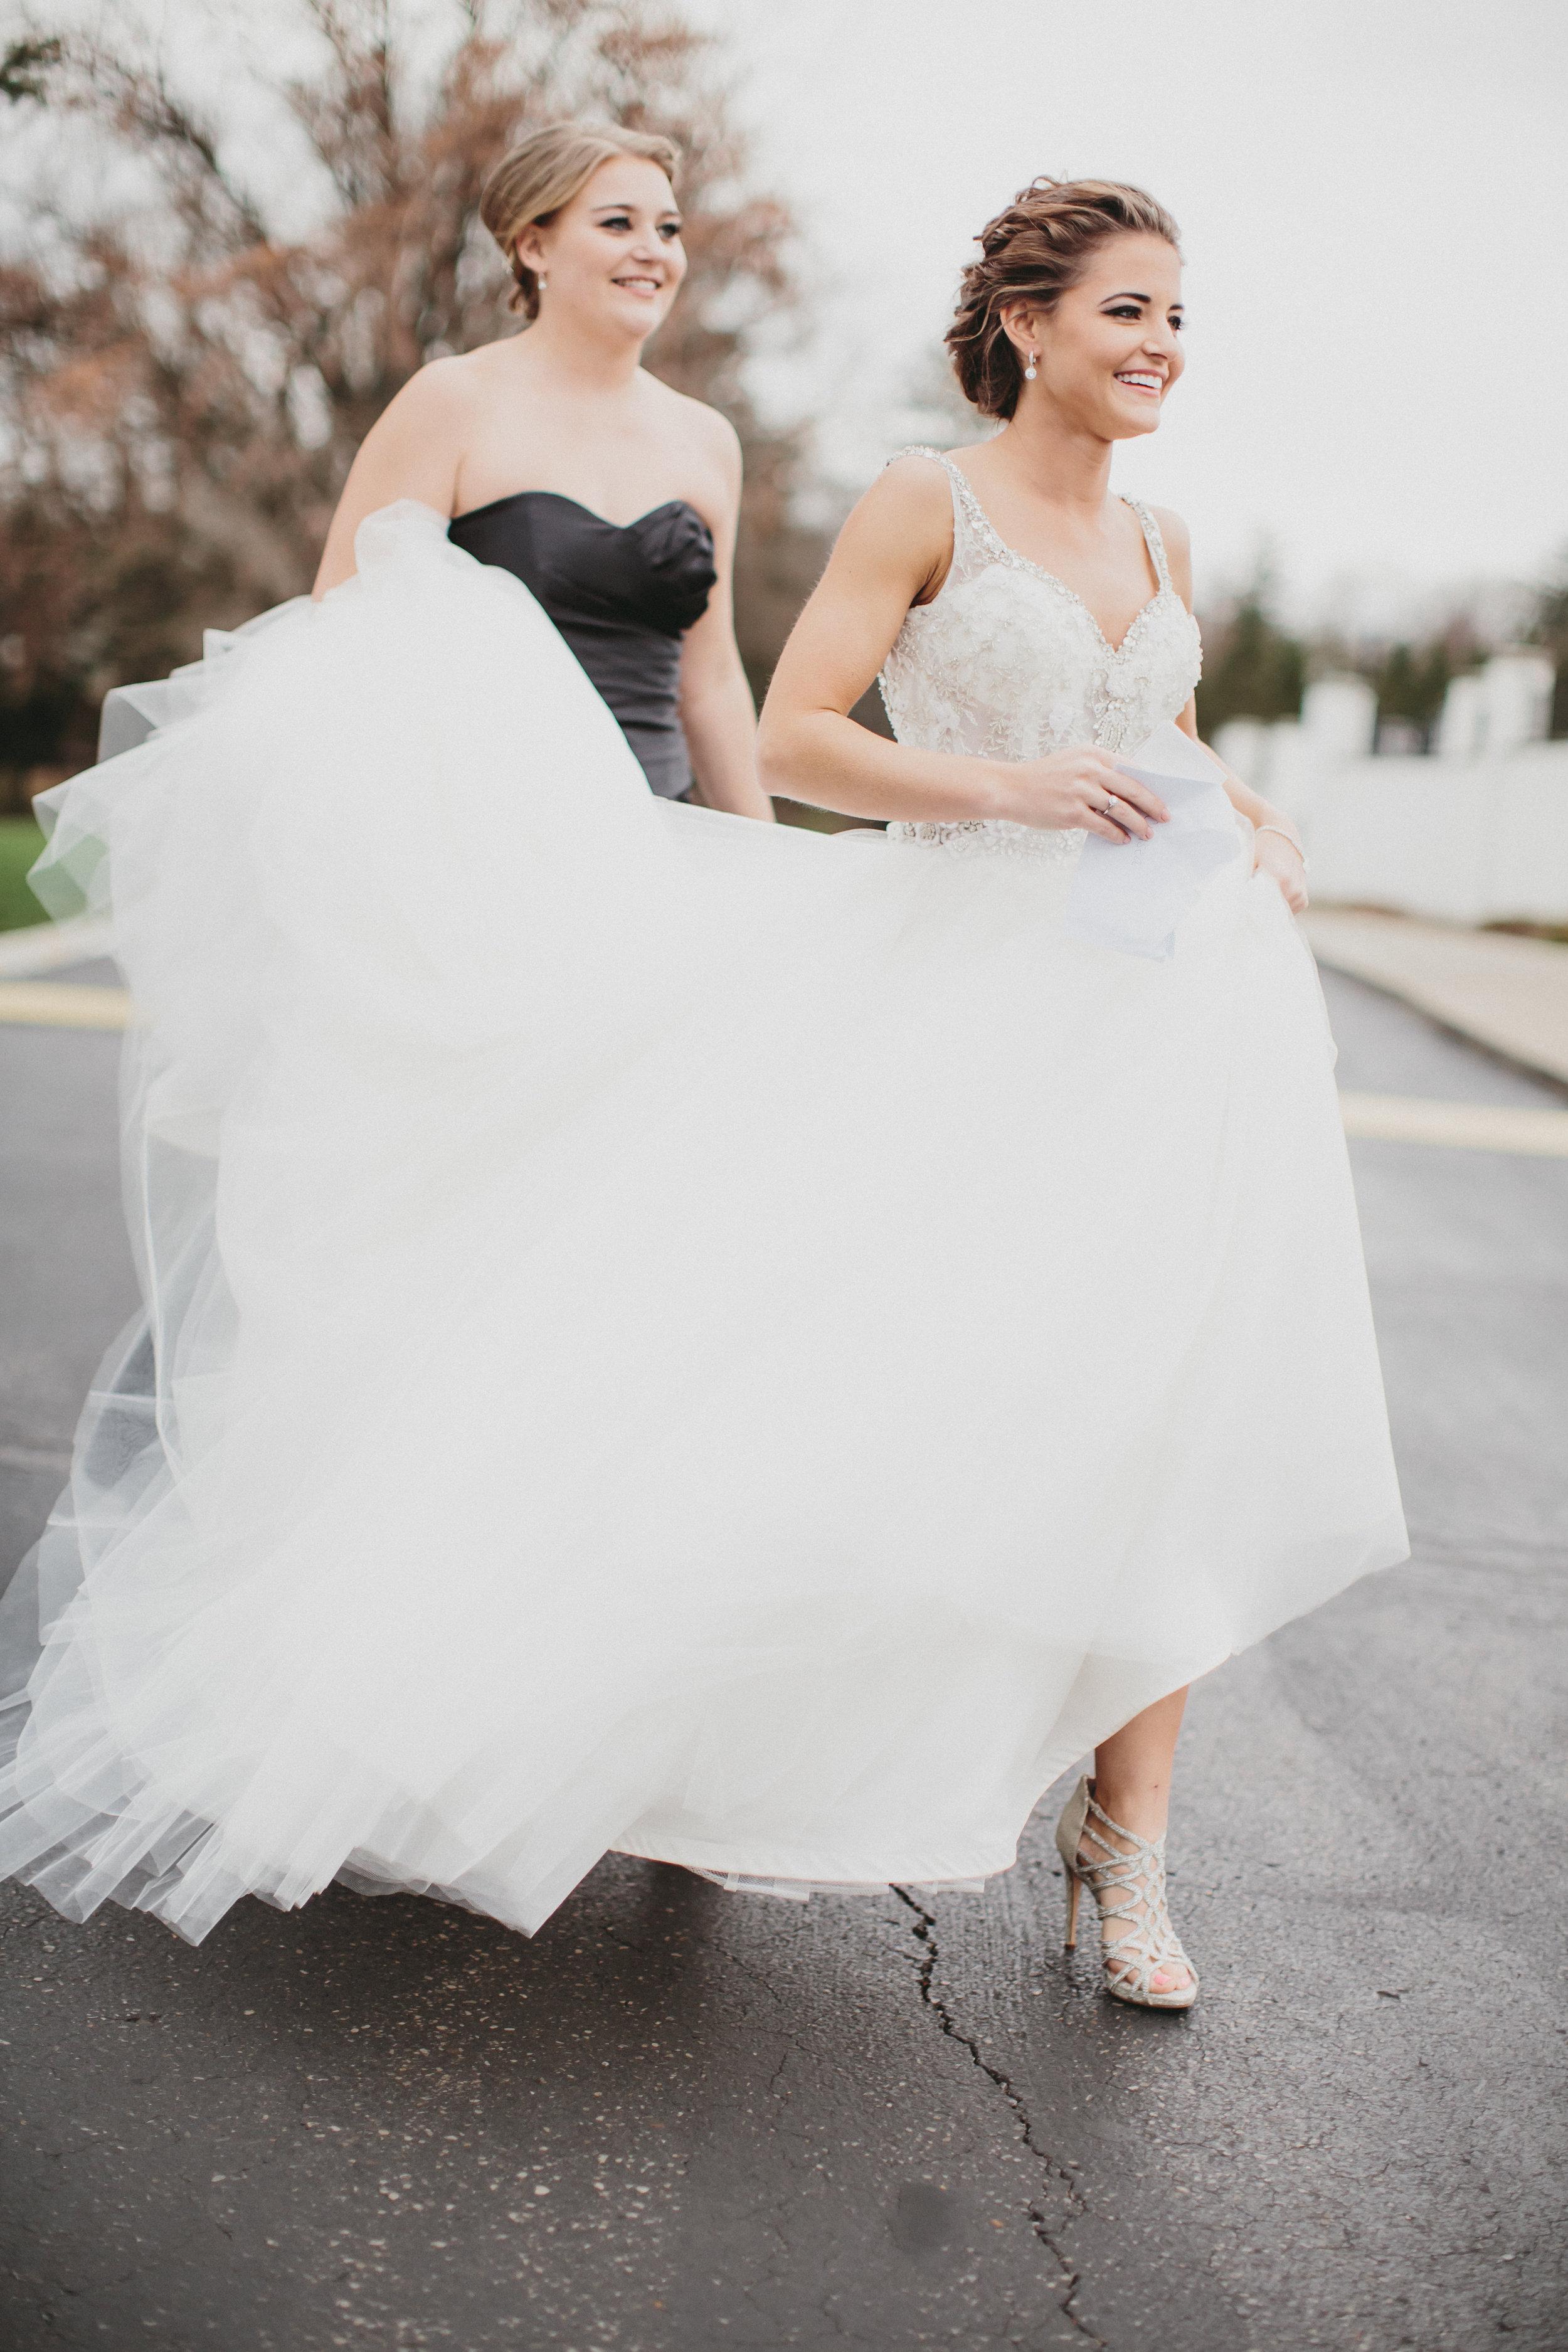 the_carrs_photography_chelsea_kirk_wedding_0261.jpg